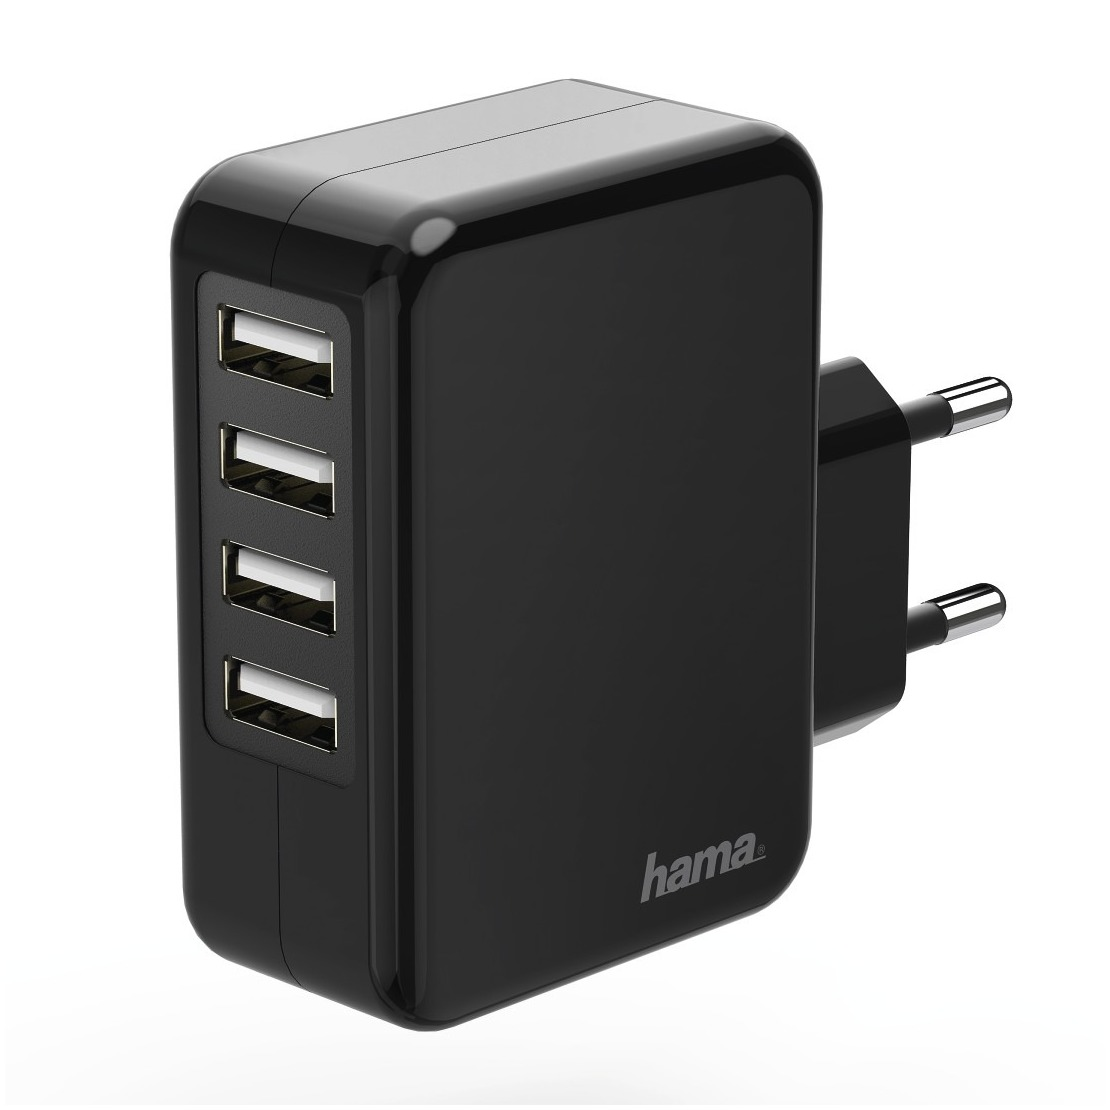 Hama oplader USB oplader 4x USB poorten 48 A zwart